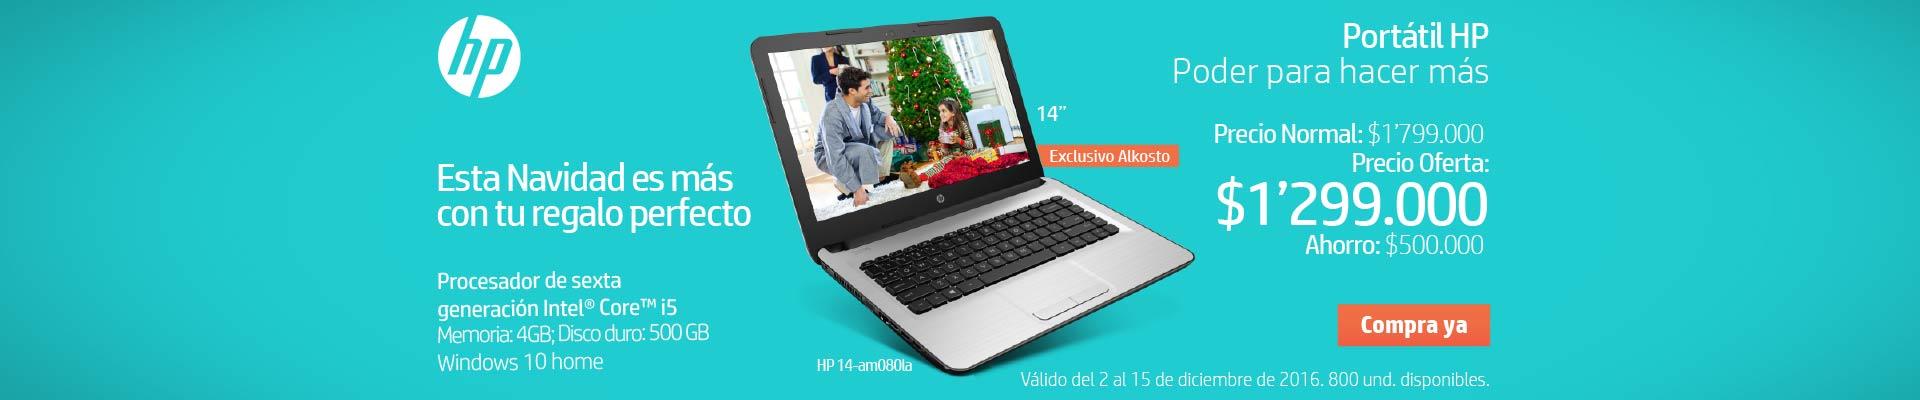 Pauta HP - Principal Home Alkosto - diciembre 3 - Portátil HP AM080 Core i5 14